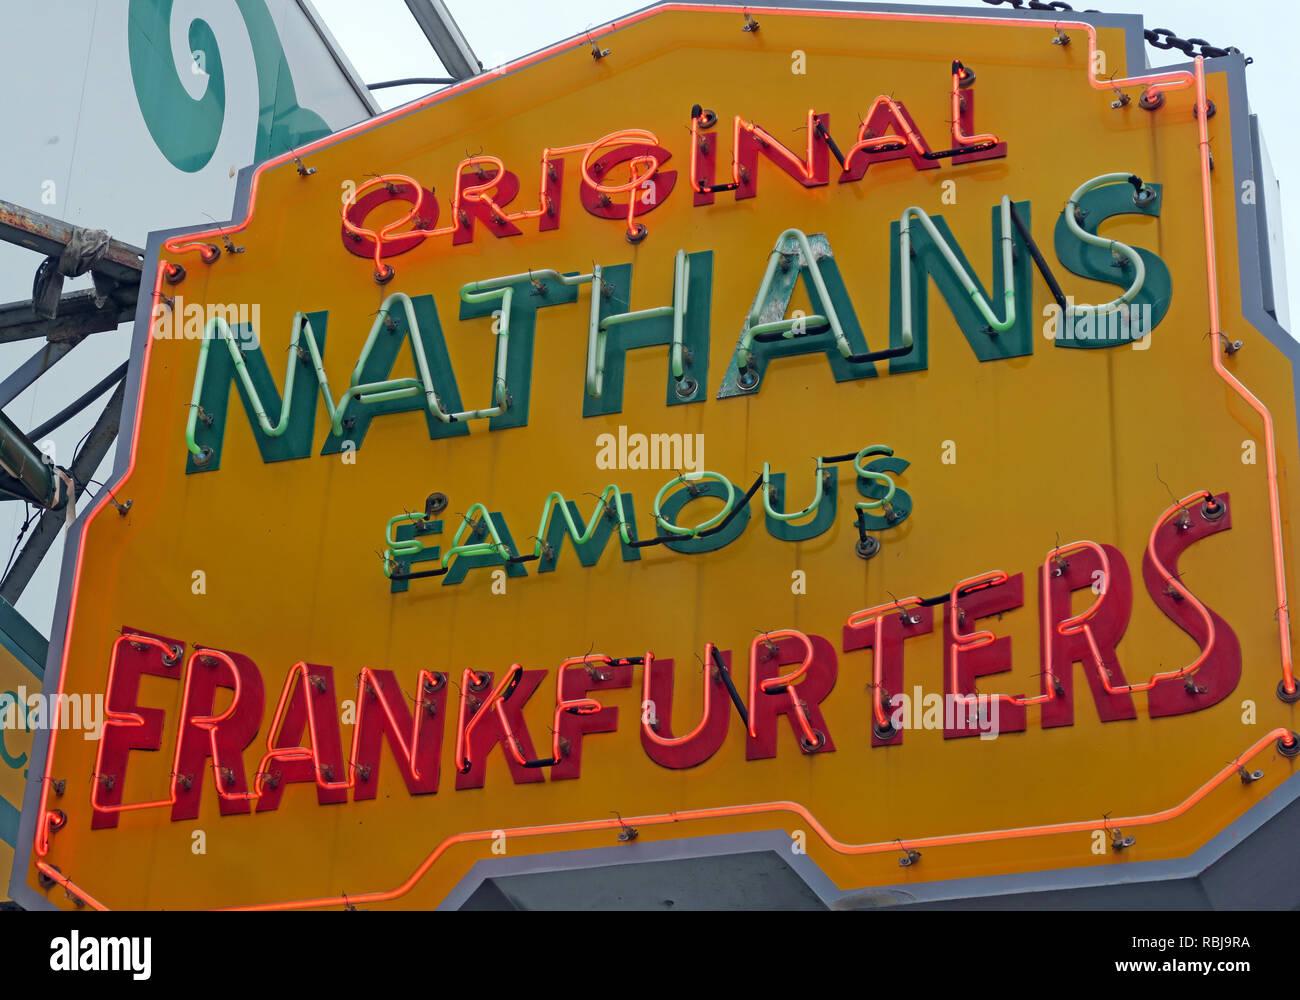 Laden Sie dieses Alamy Stockfoto Nathans Handwerker berühmten Würstchen Frankfurter Original Restaurant, Deli, Fast Food, Coney Island, im Stadtbezirk Brooklyn, New York, NY, USA - RBJ9RA